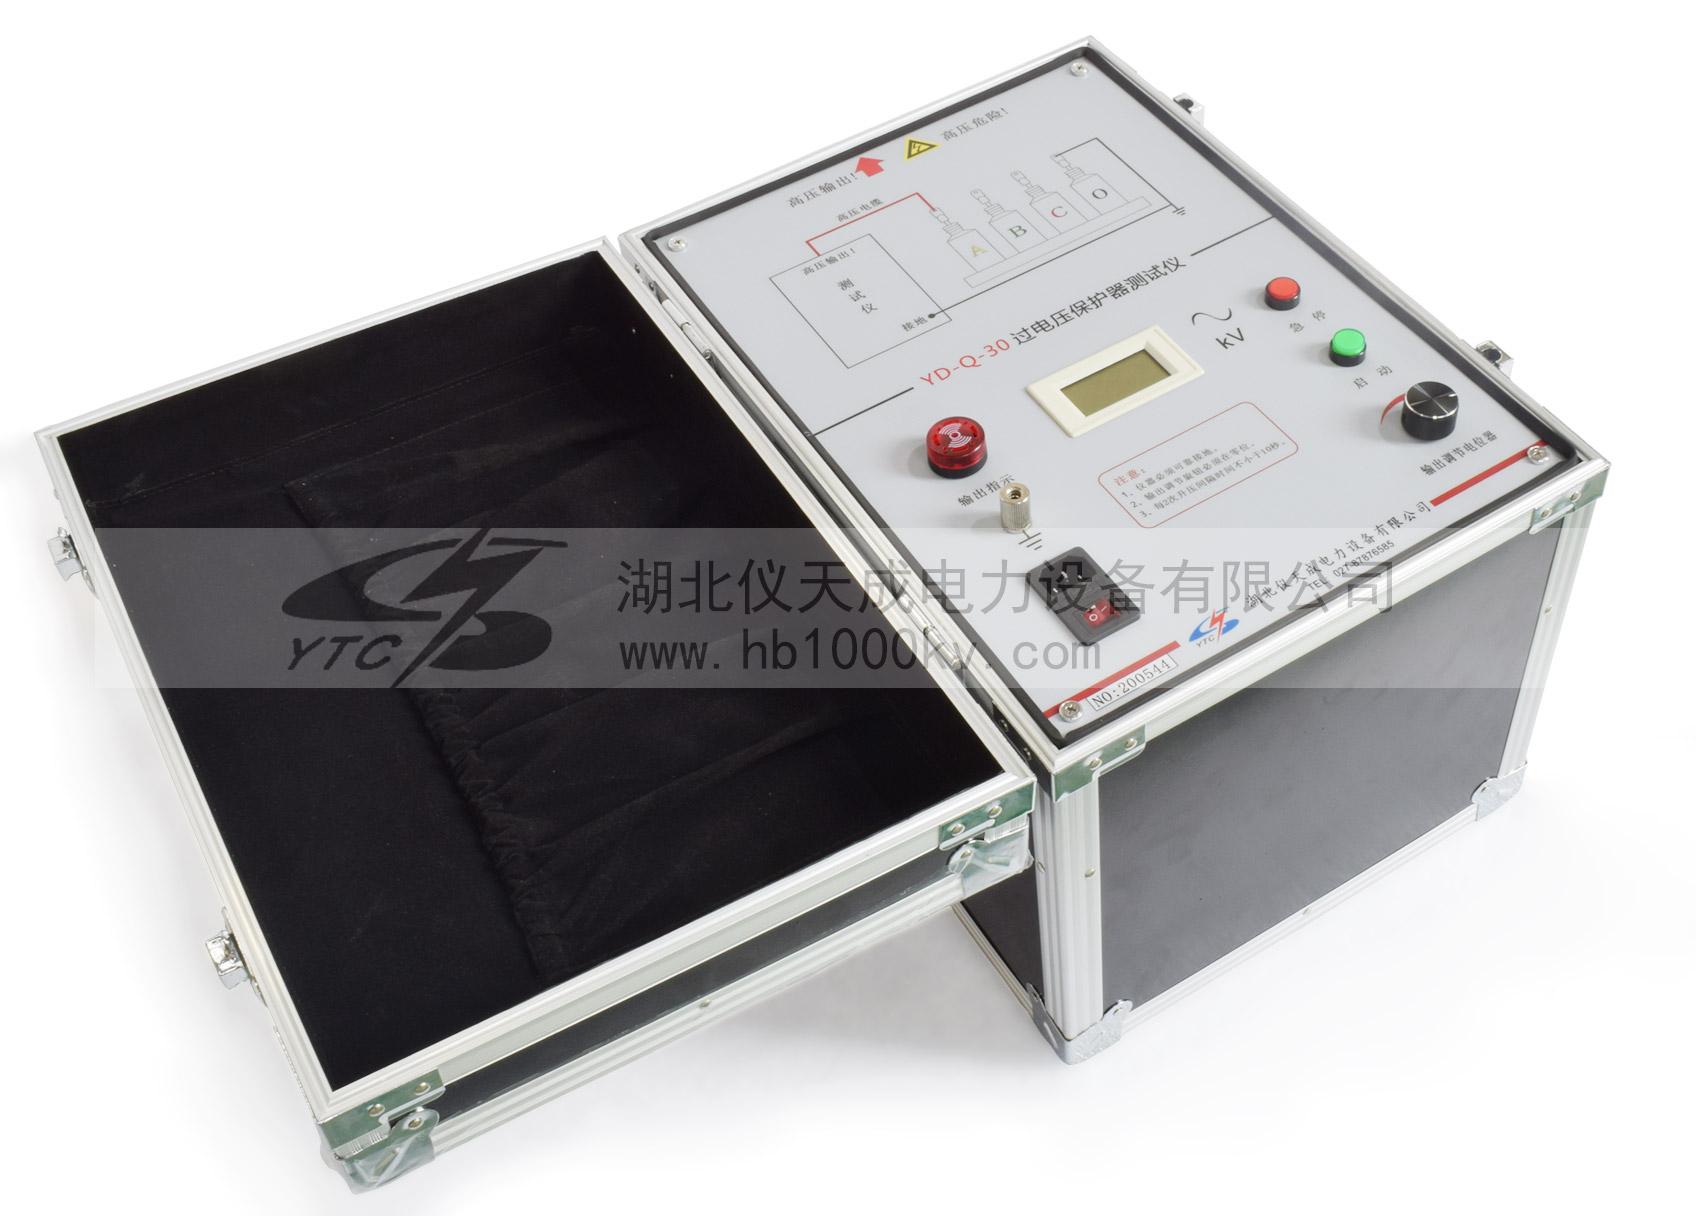 YD-Q-30过电压保护器测试仪主机